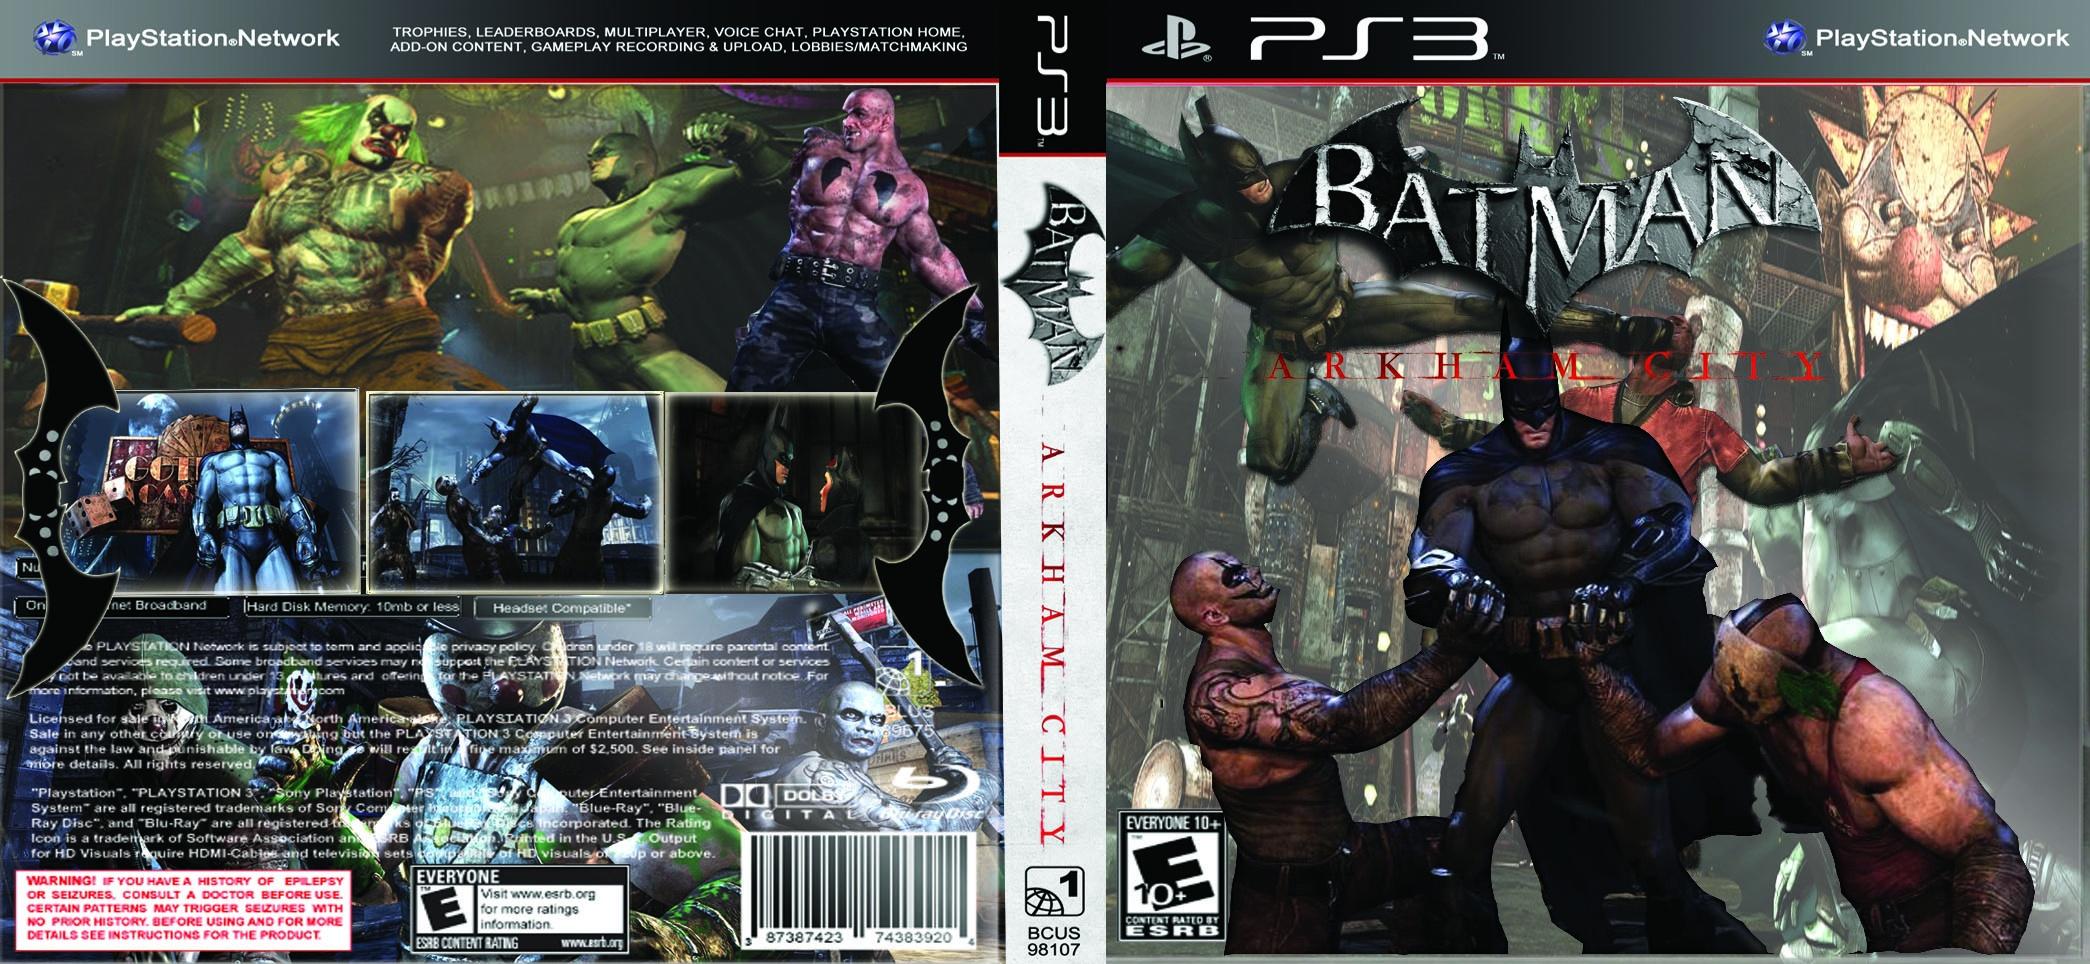 Batman Arkham City Dark Knight Edition PlayStation 3 Box Art Cover By Hugobij